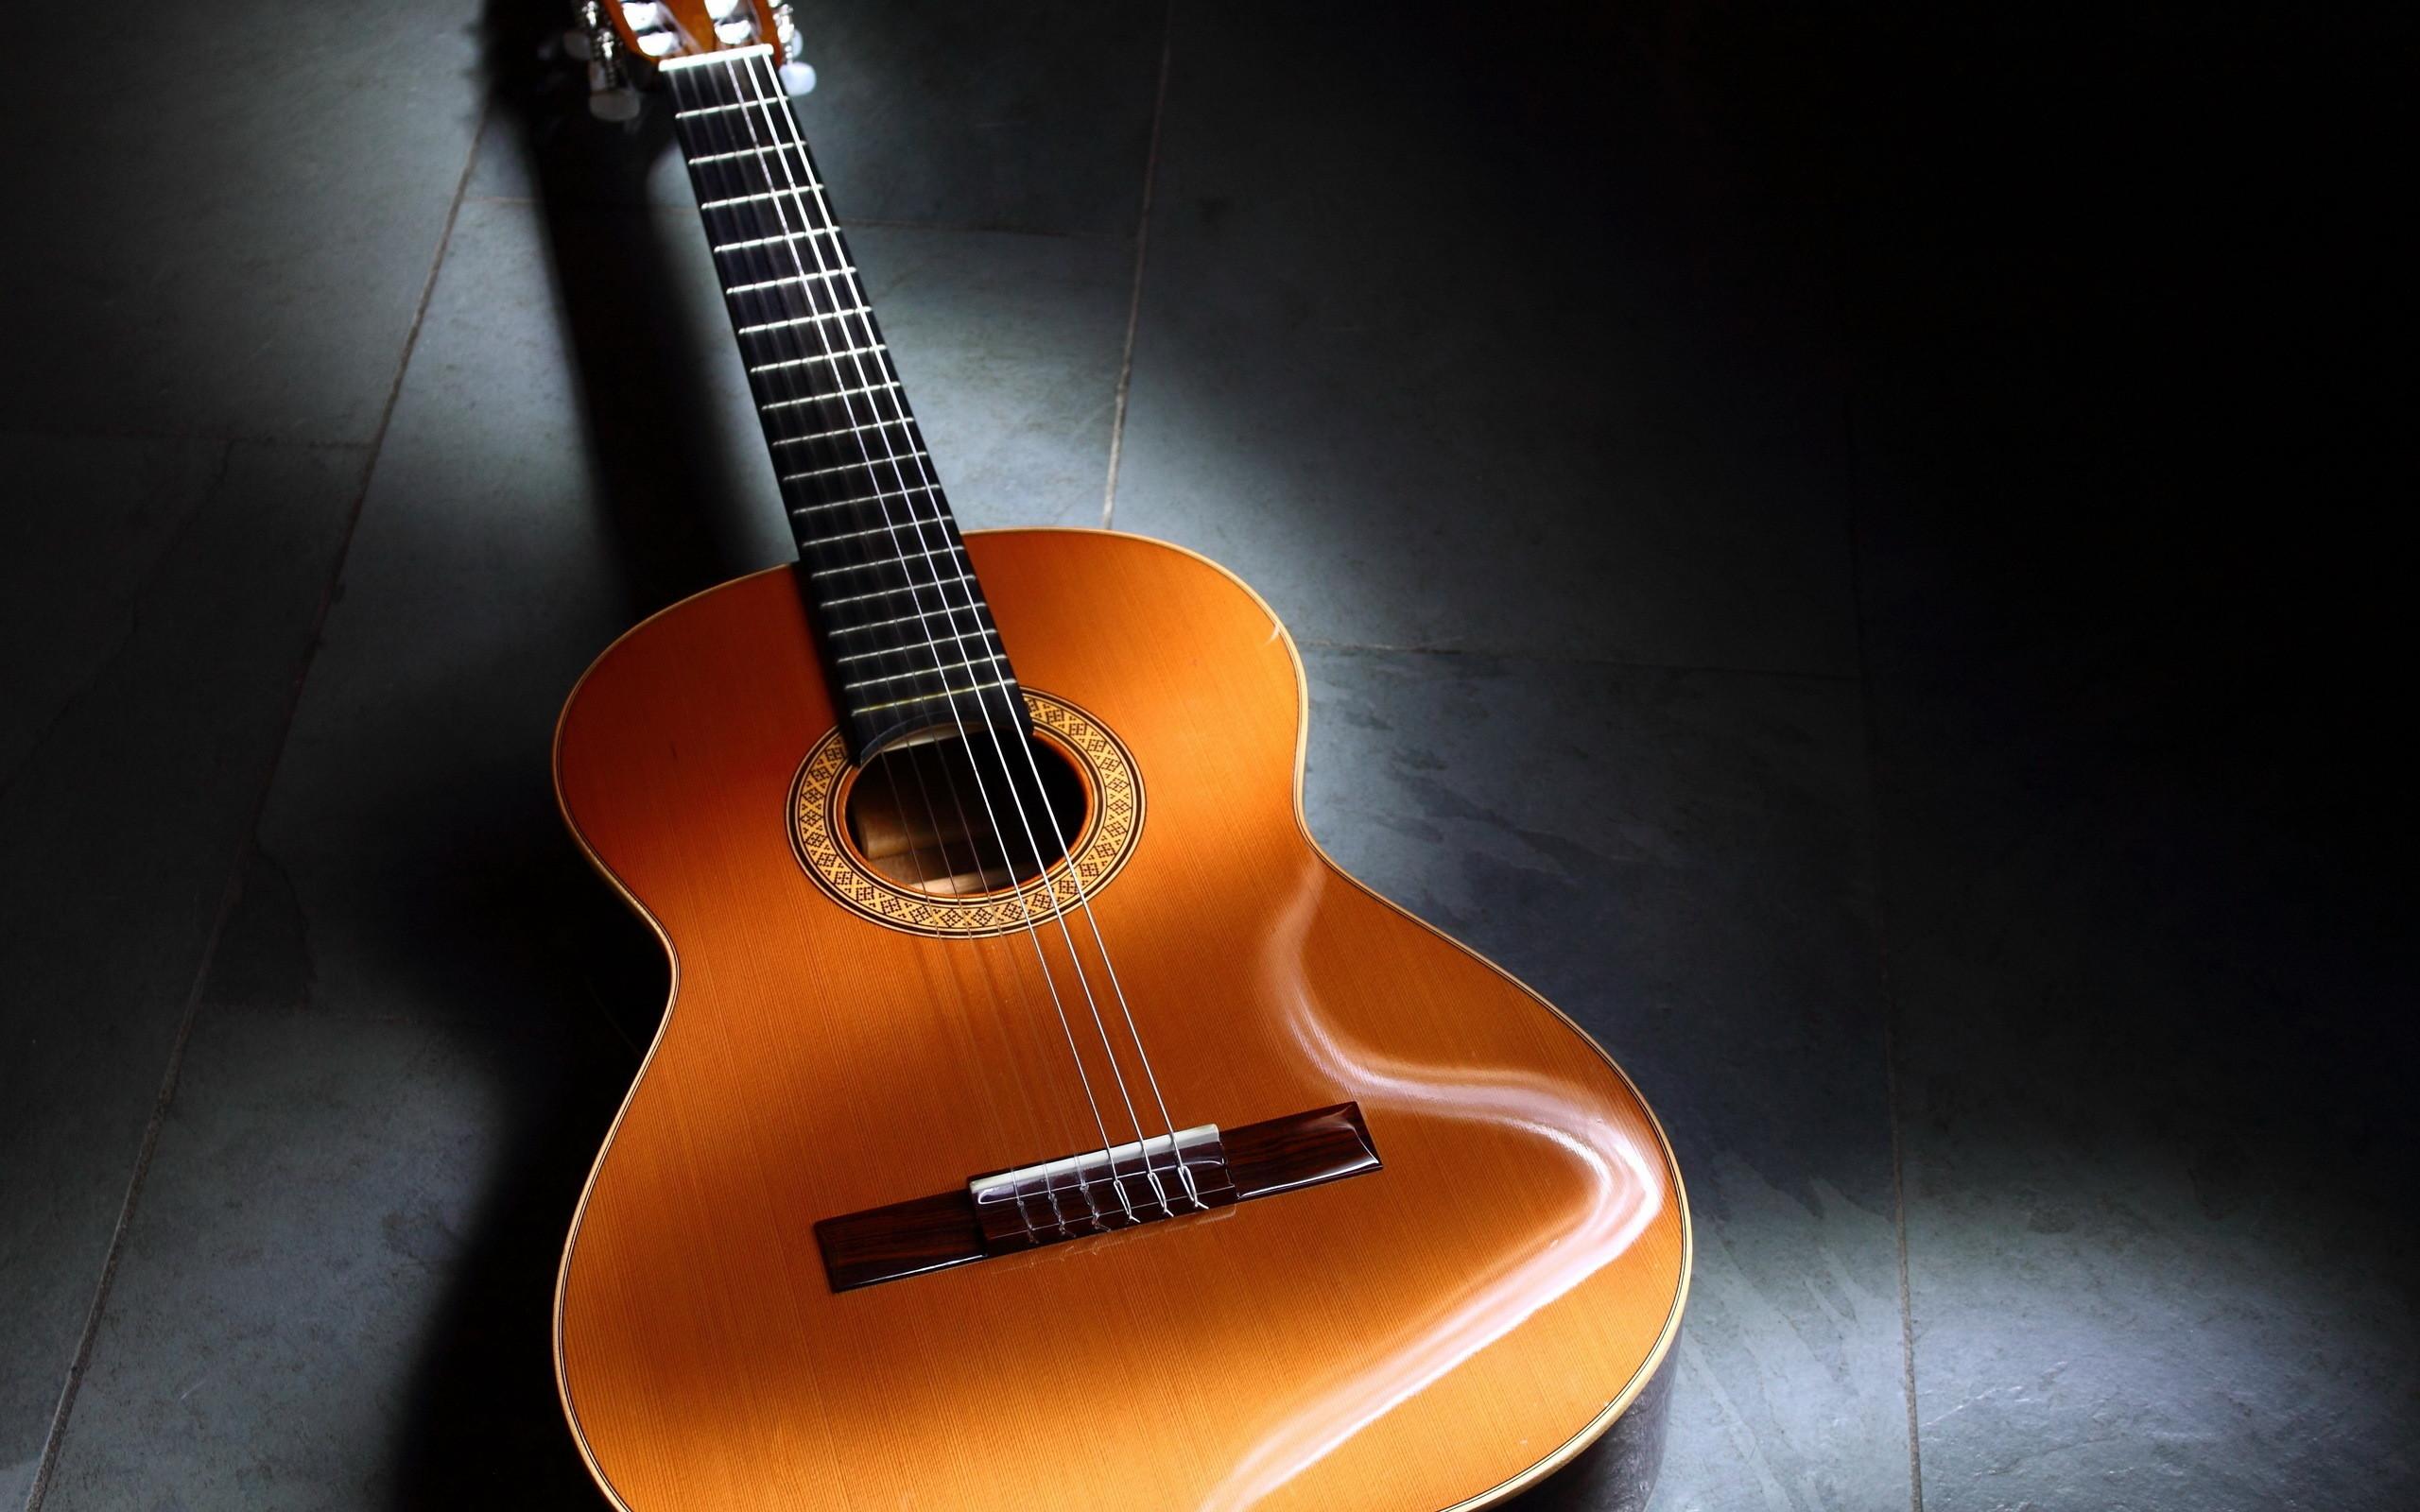 Taylor Guitar Wallpaper (59+ images)Taylor Swift Acoustic Guitar Wallpaper